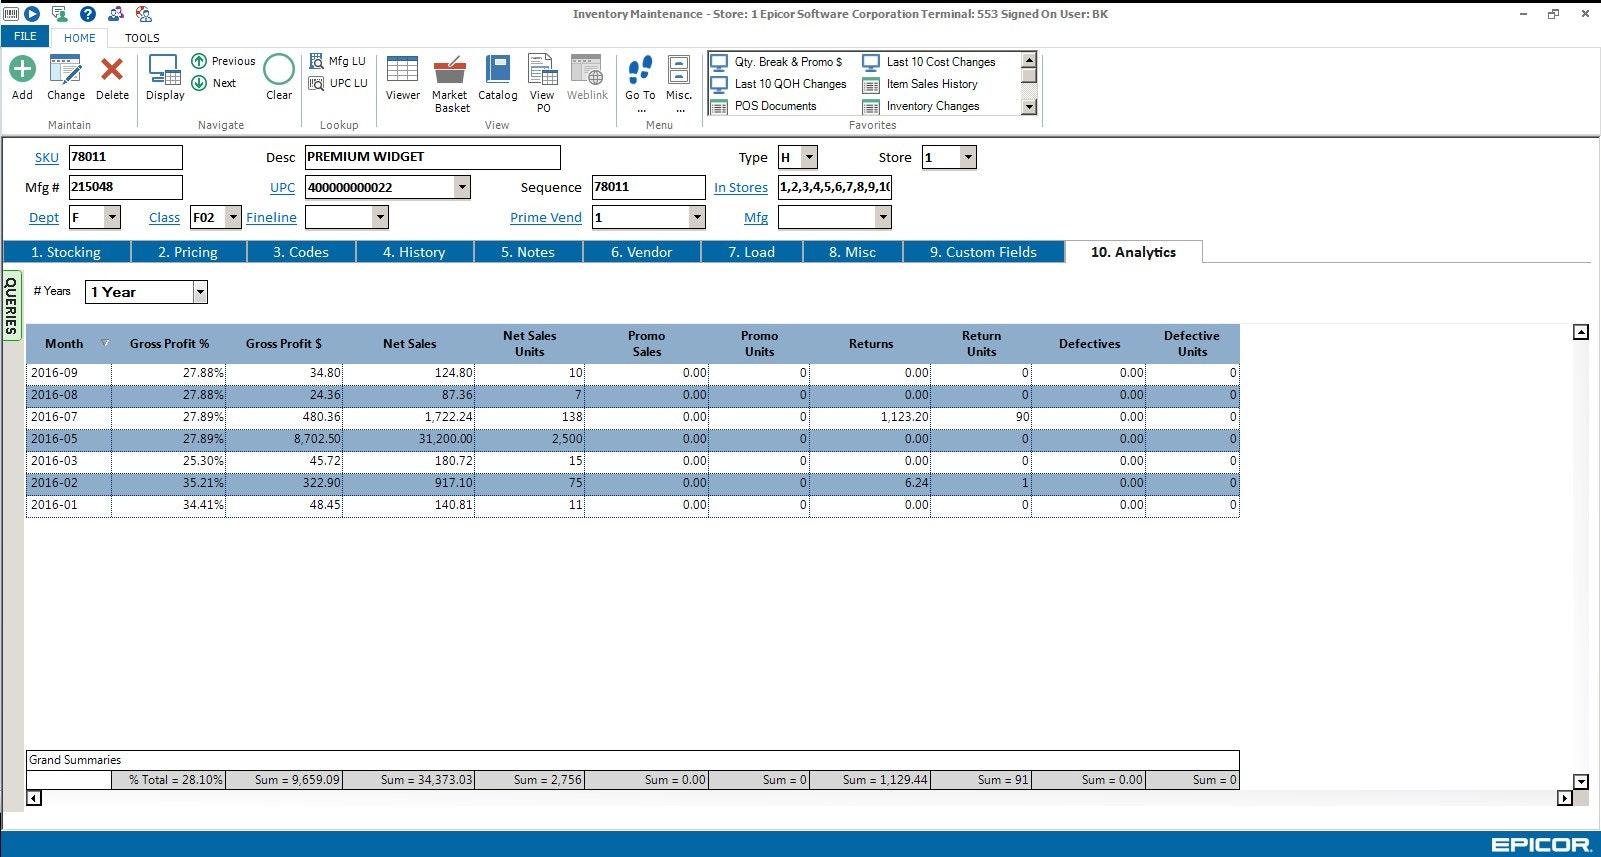 EagleNSeries - Inventory maintenance